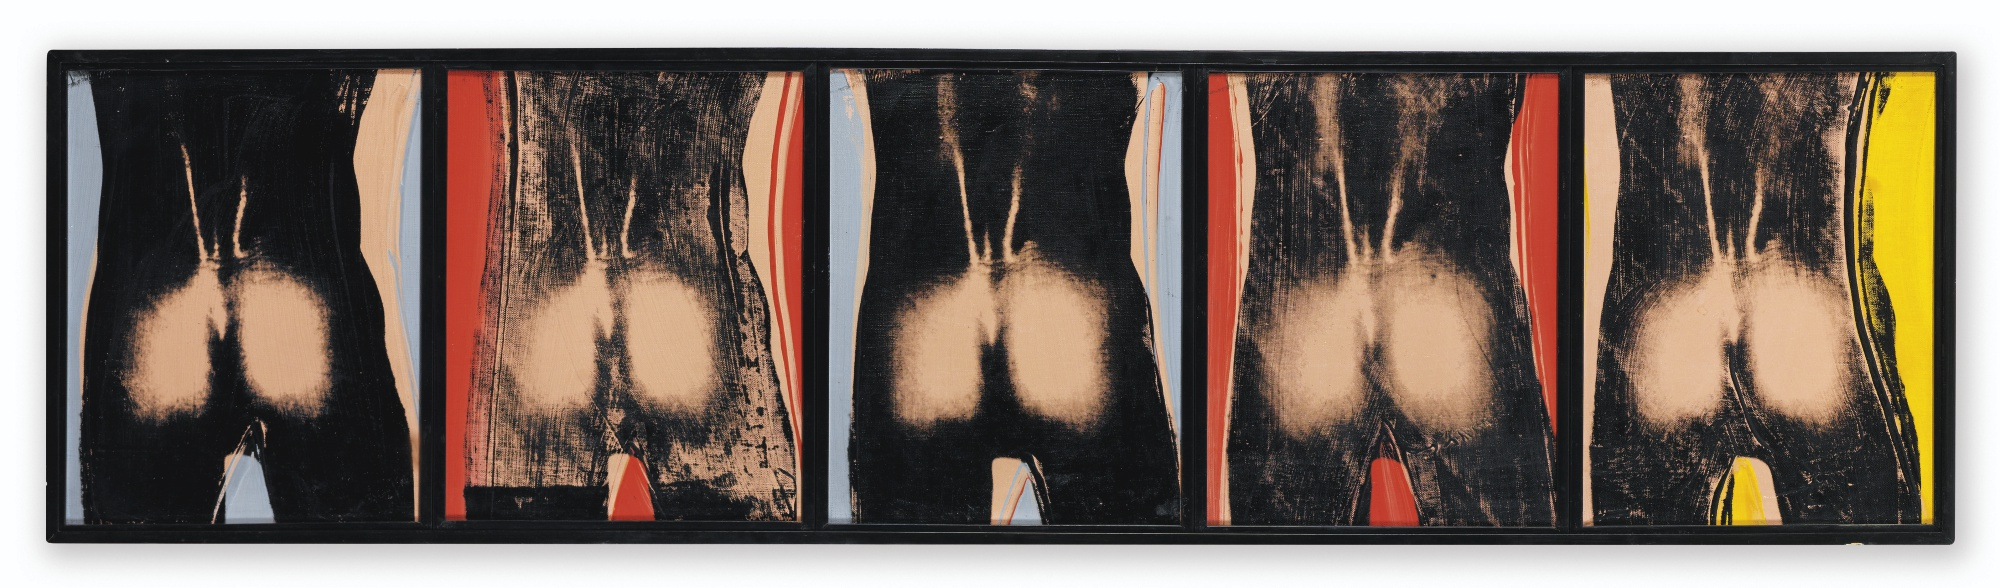 Andy Warhol-Torsos-1977